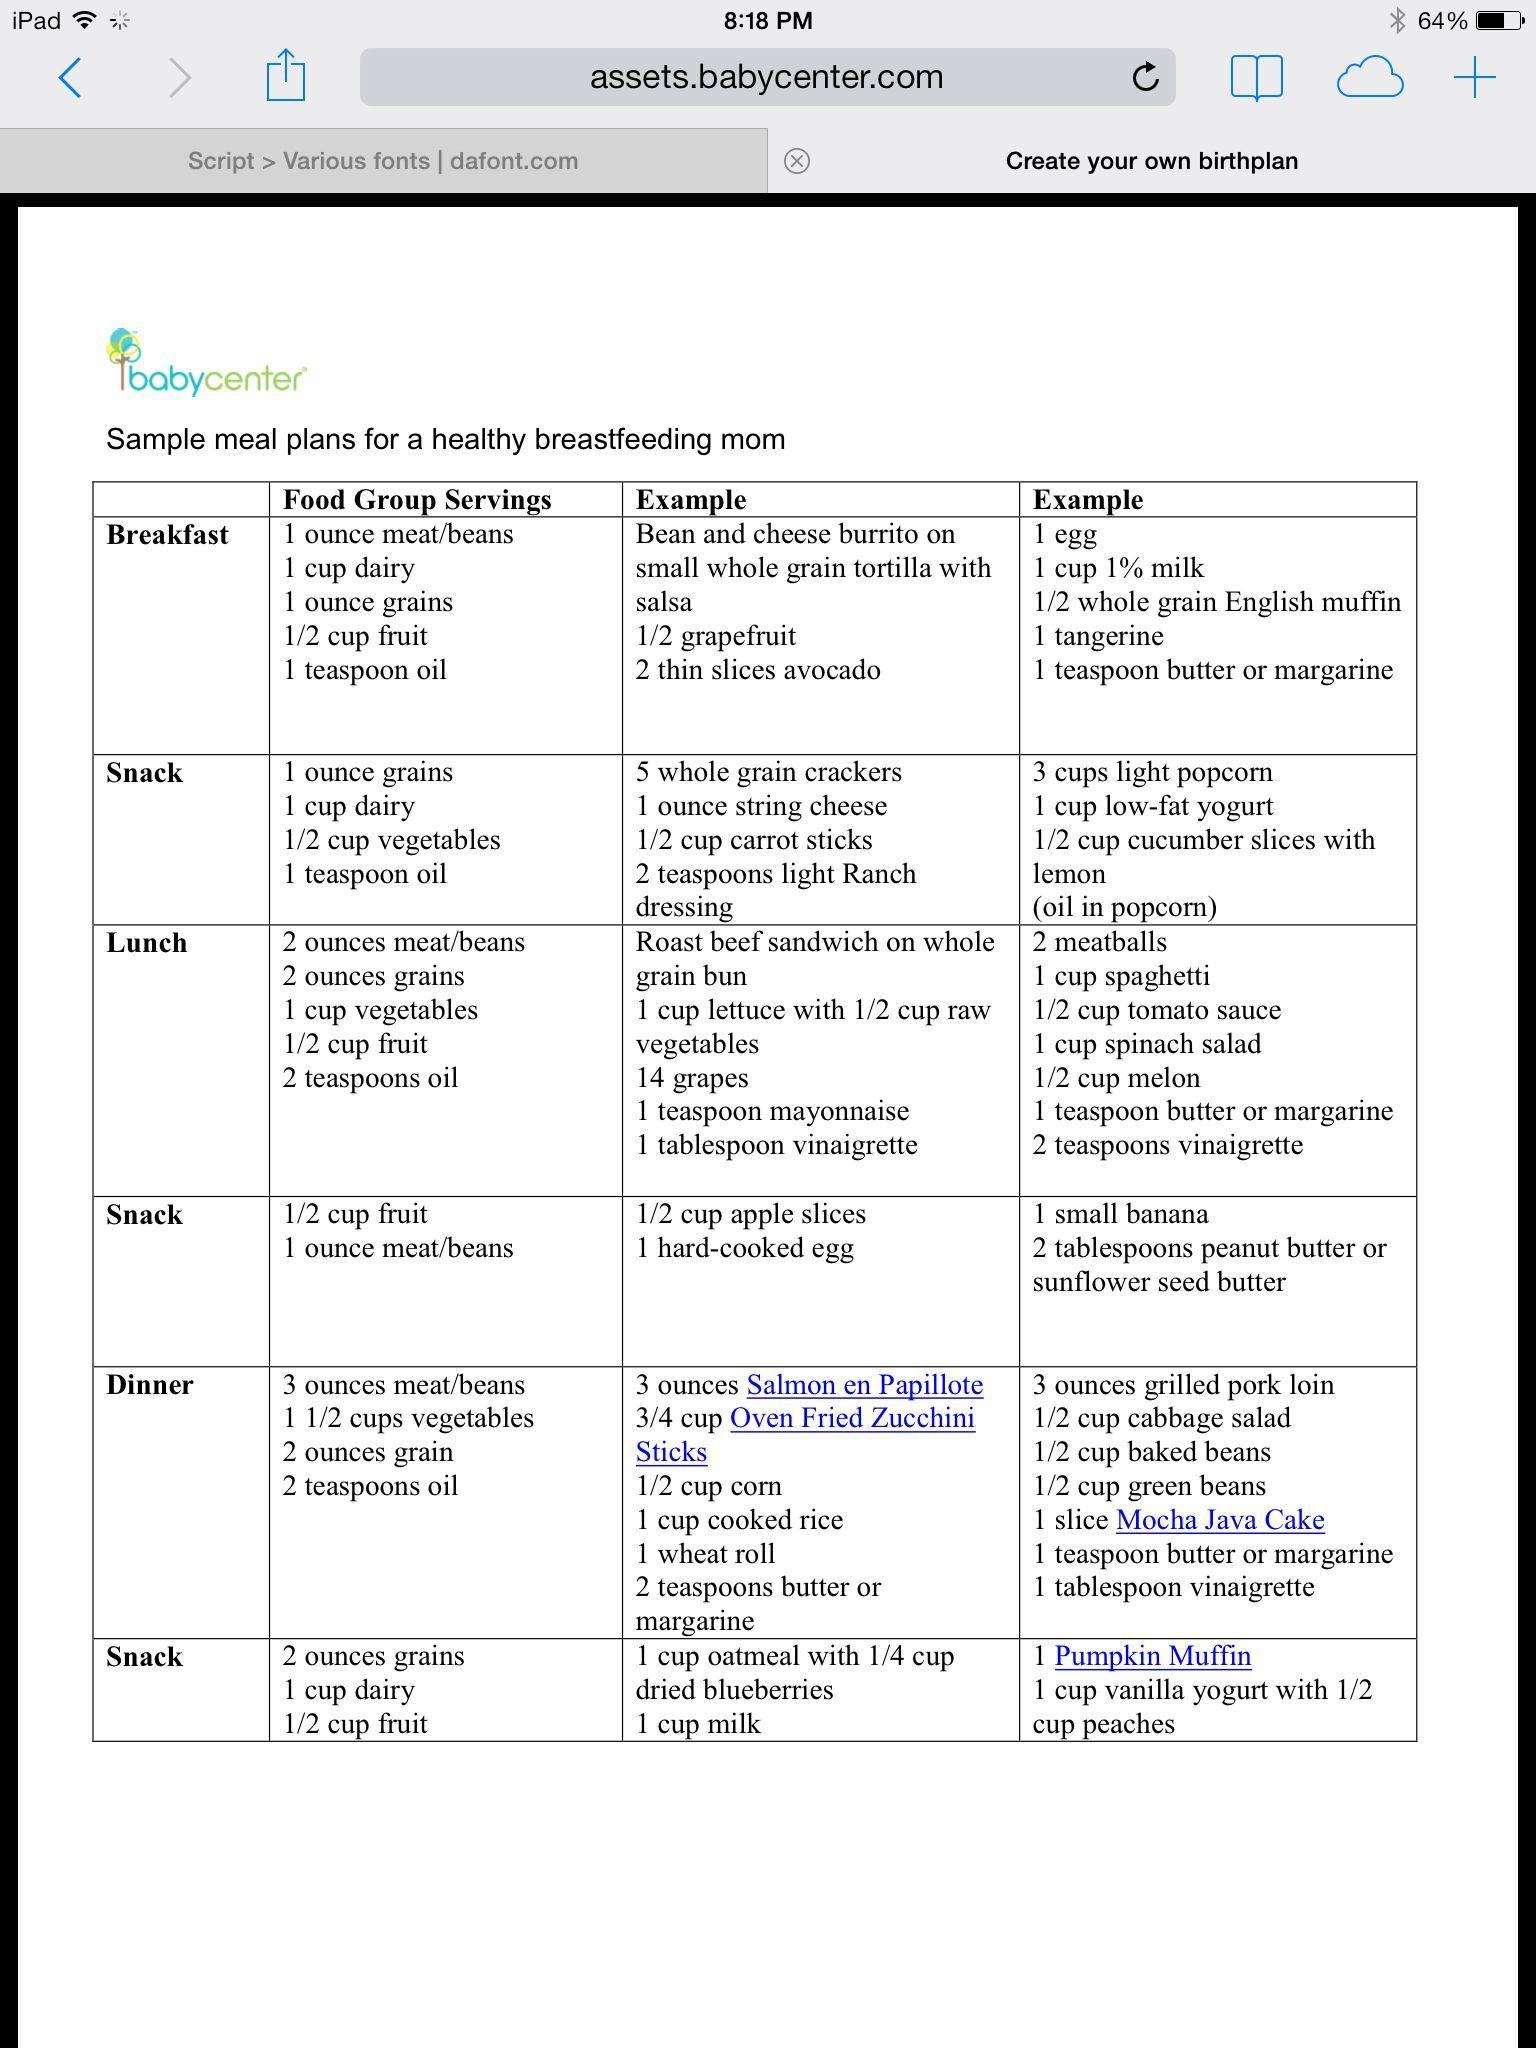 005 Unforgettable Breastfeeding Meal Plan Sample Pdf Photo Full